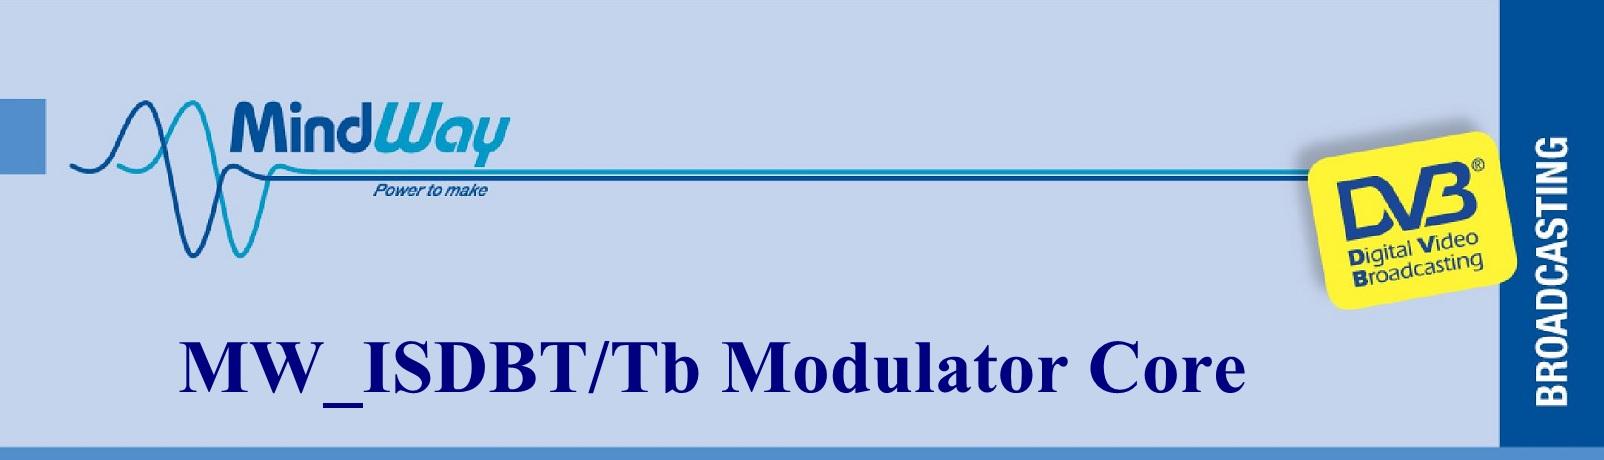 ISDBTtb_front